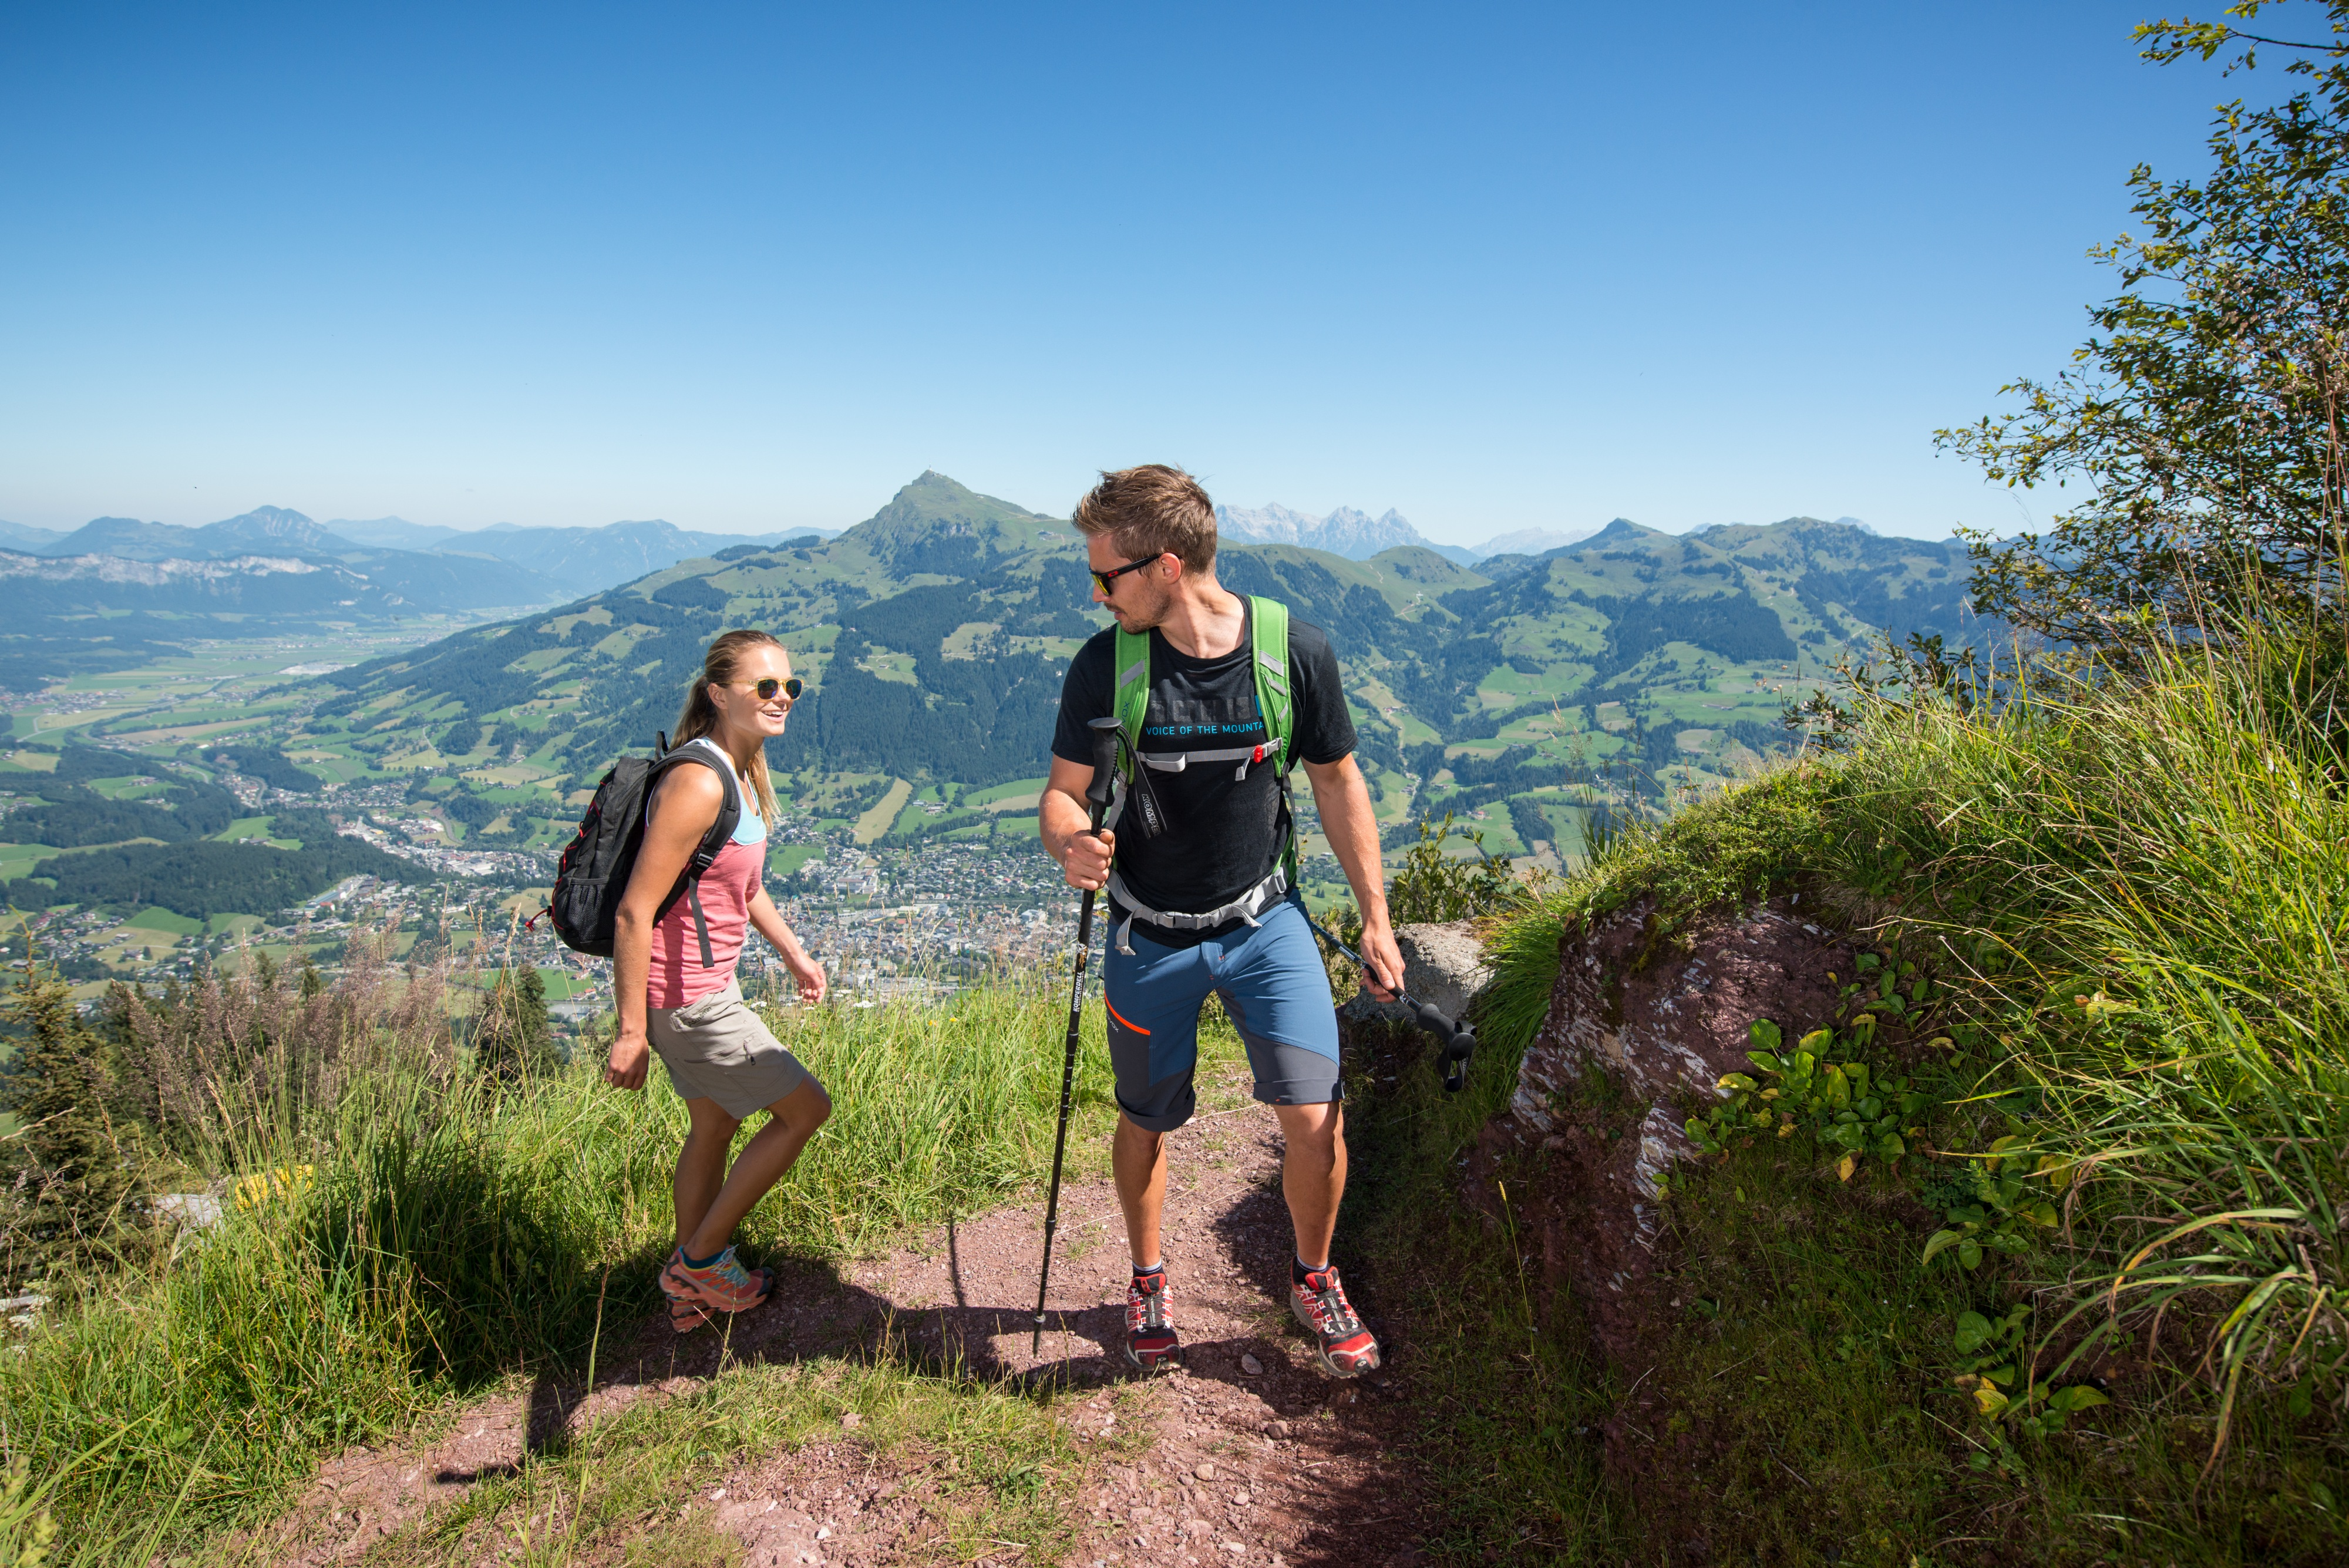 Ausflug Kitzbühel Wanderung Sommer